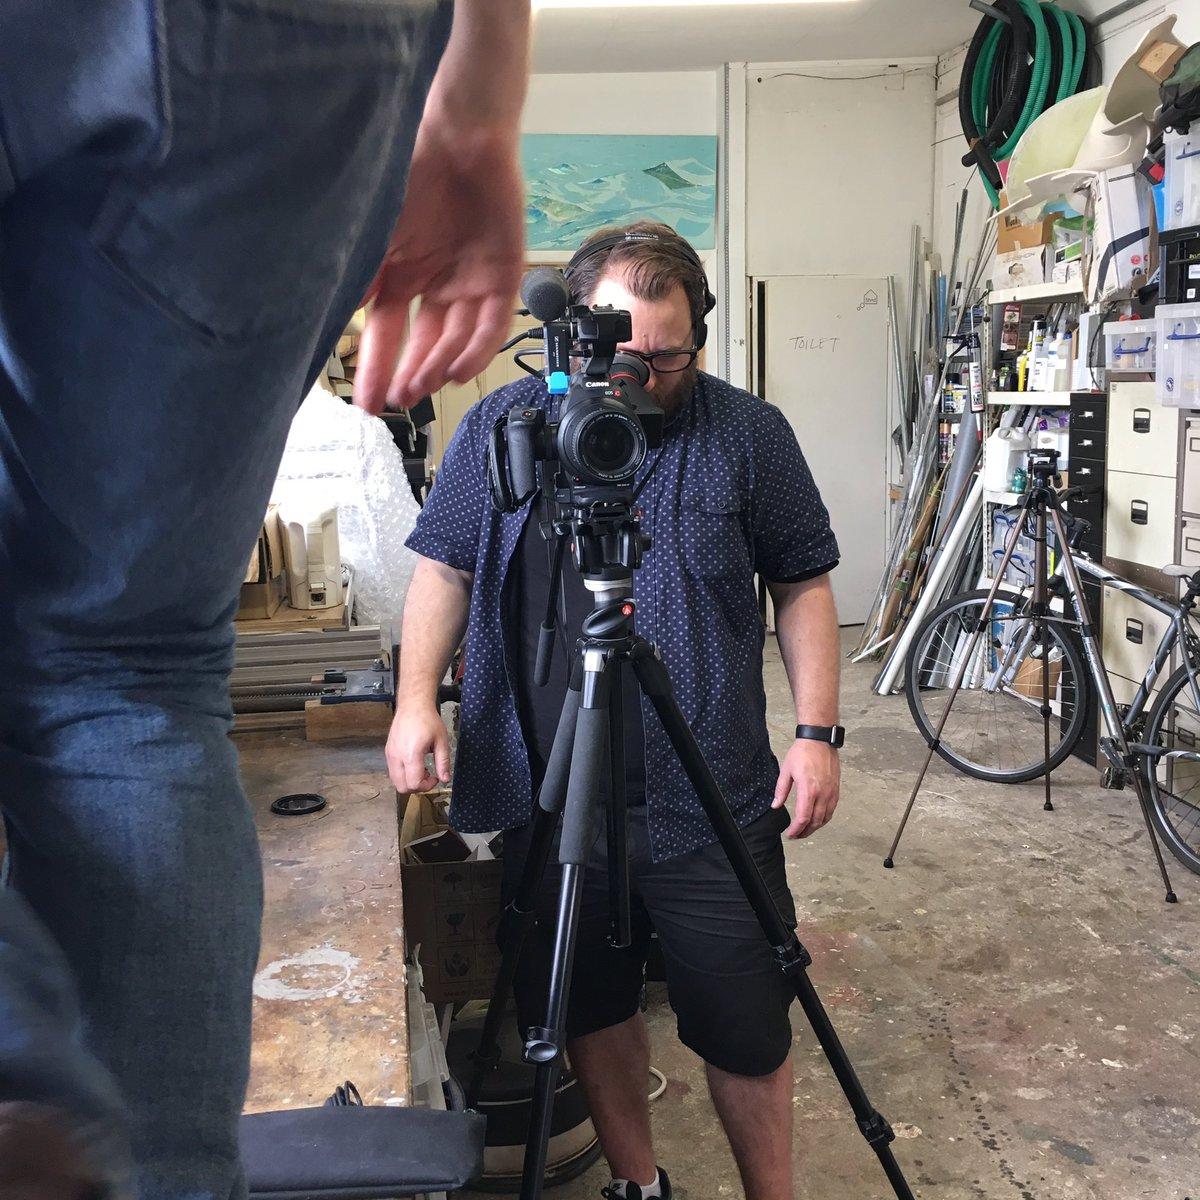 Building and filming.... #stem #steam #invent #pedalpowered #bike #wecreateedu <br>http://pic.twitter.com/kUv1GKn6IX